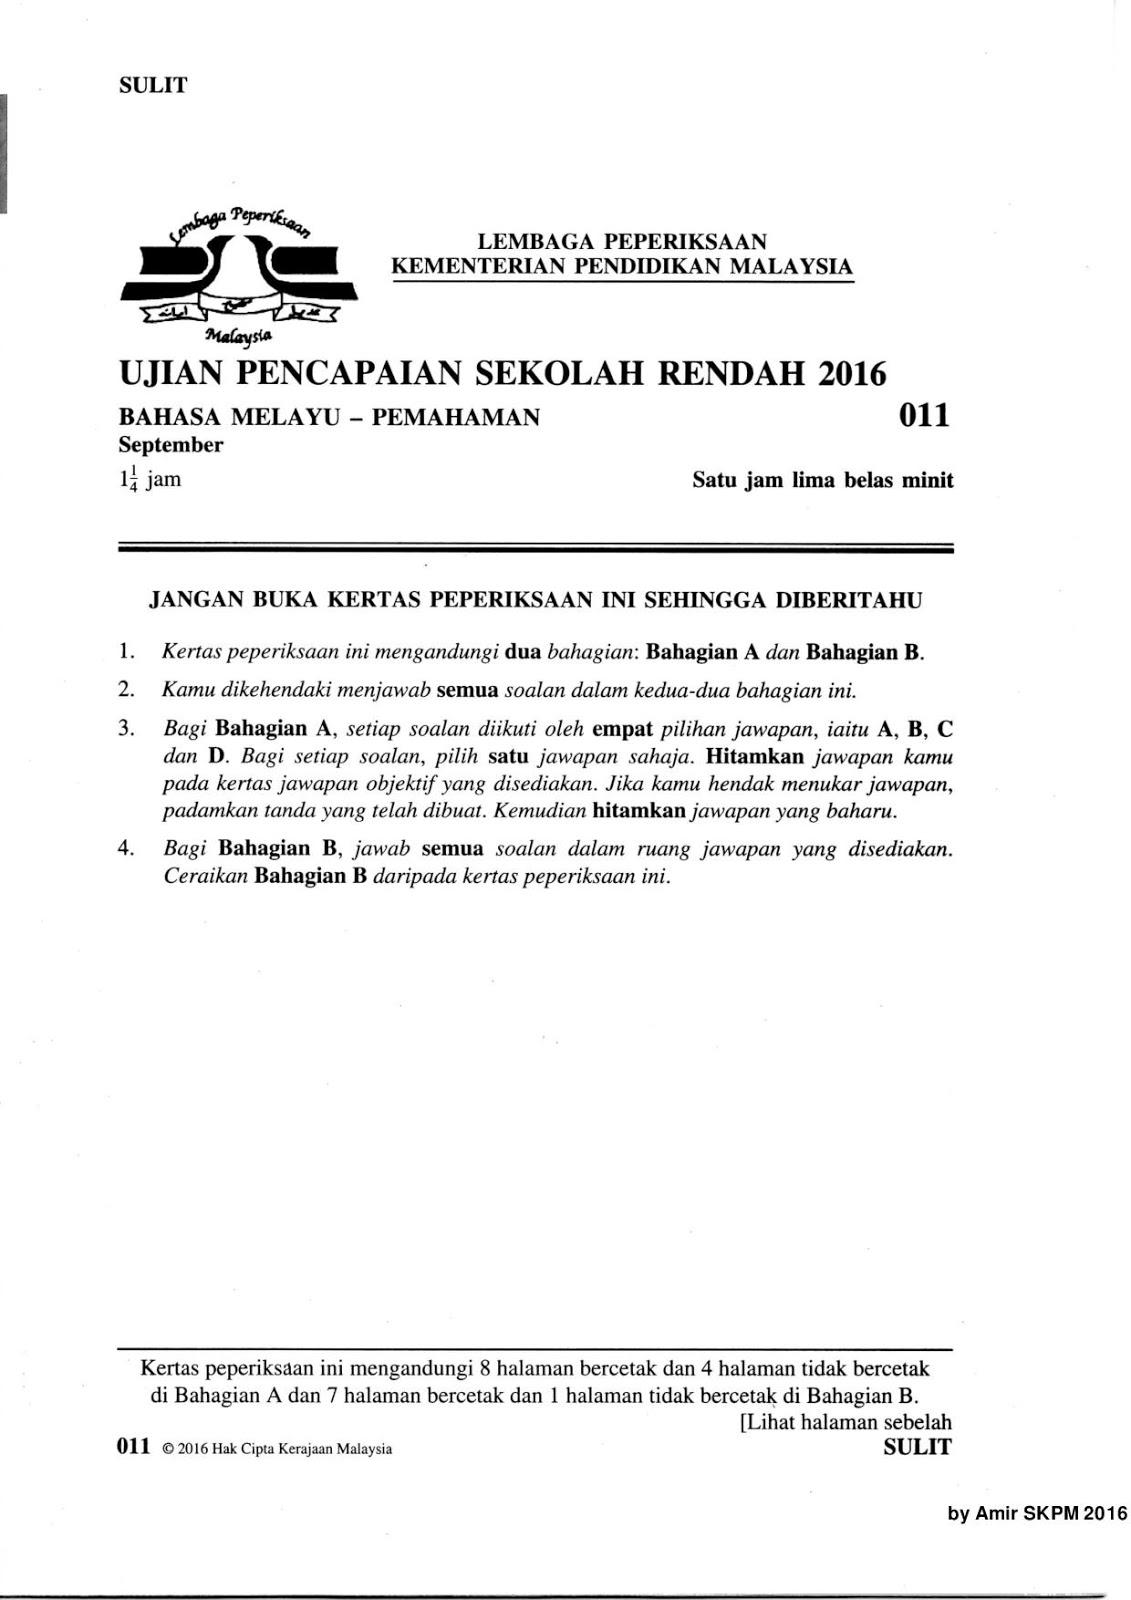 Soalan Bahasa Melayu Pemahaman Upsr 2016